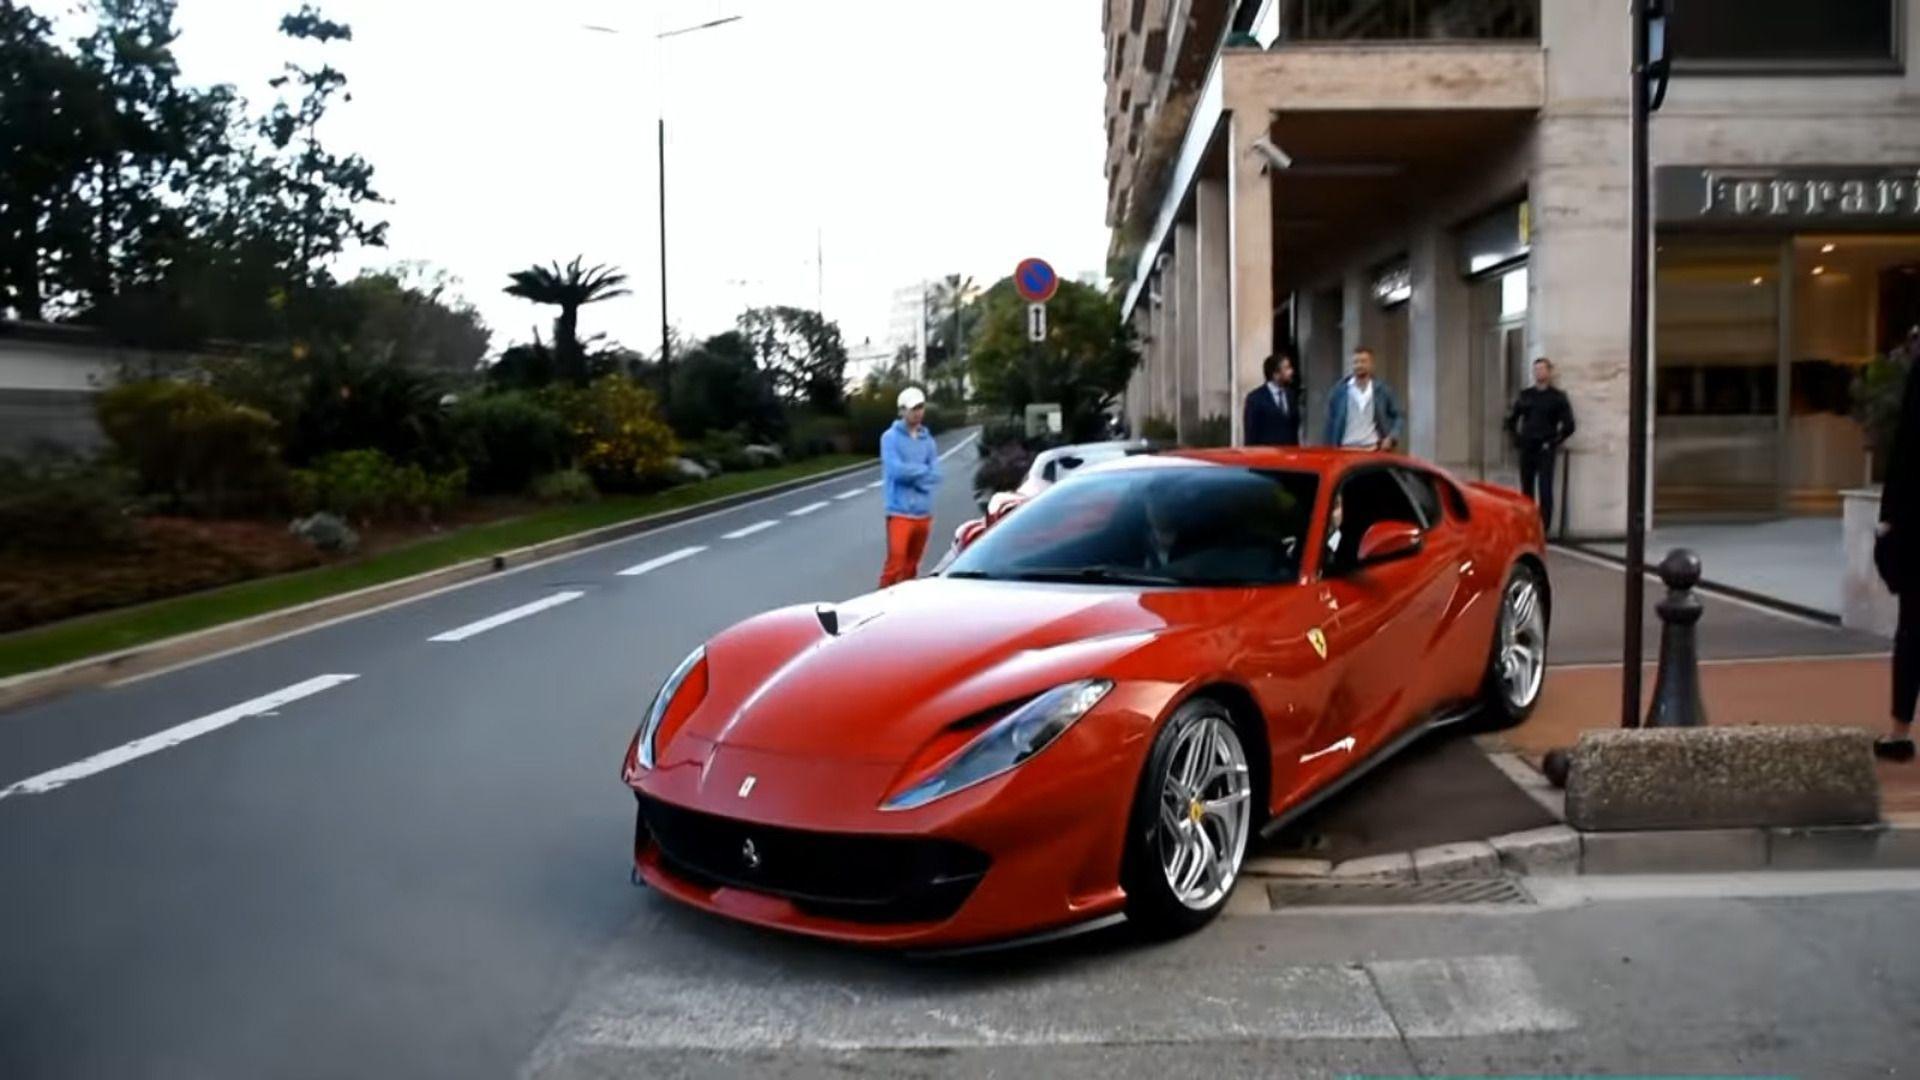 Ferrari 812 Superfast Wallpapers - Wallpaper Cave